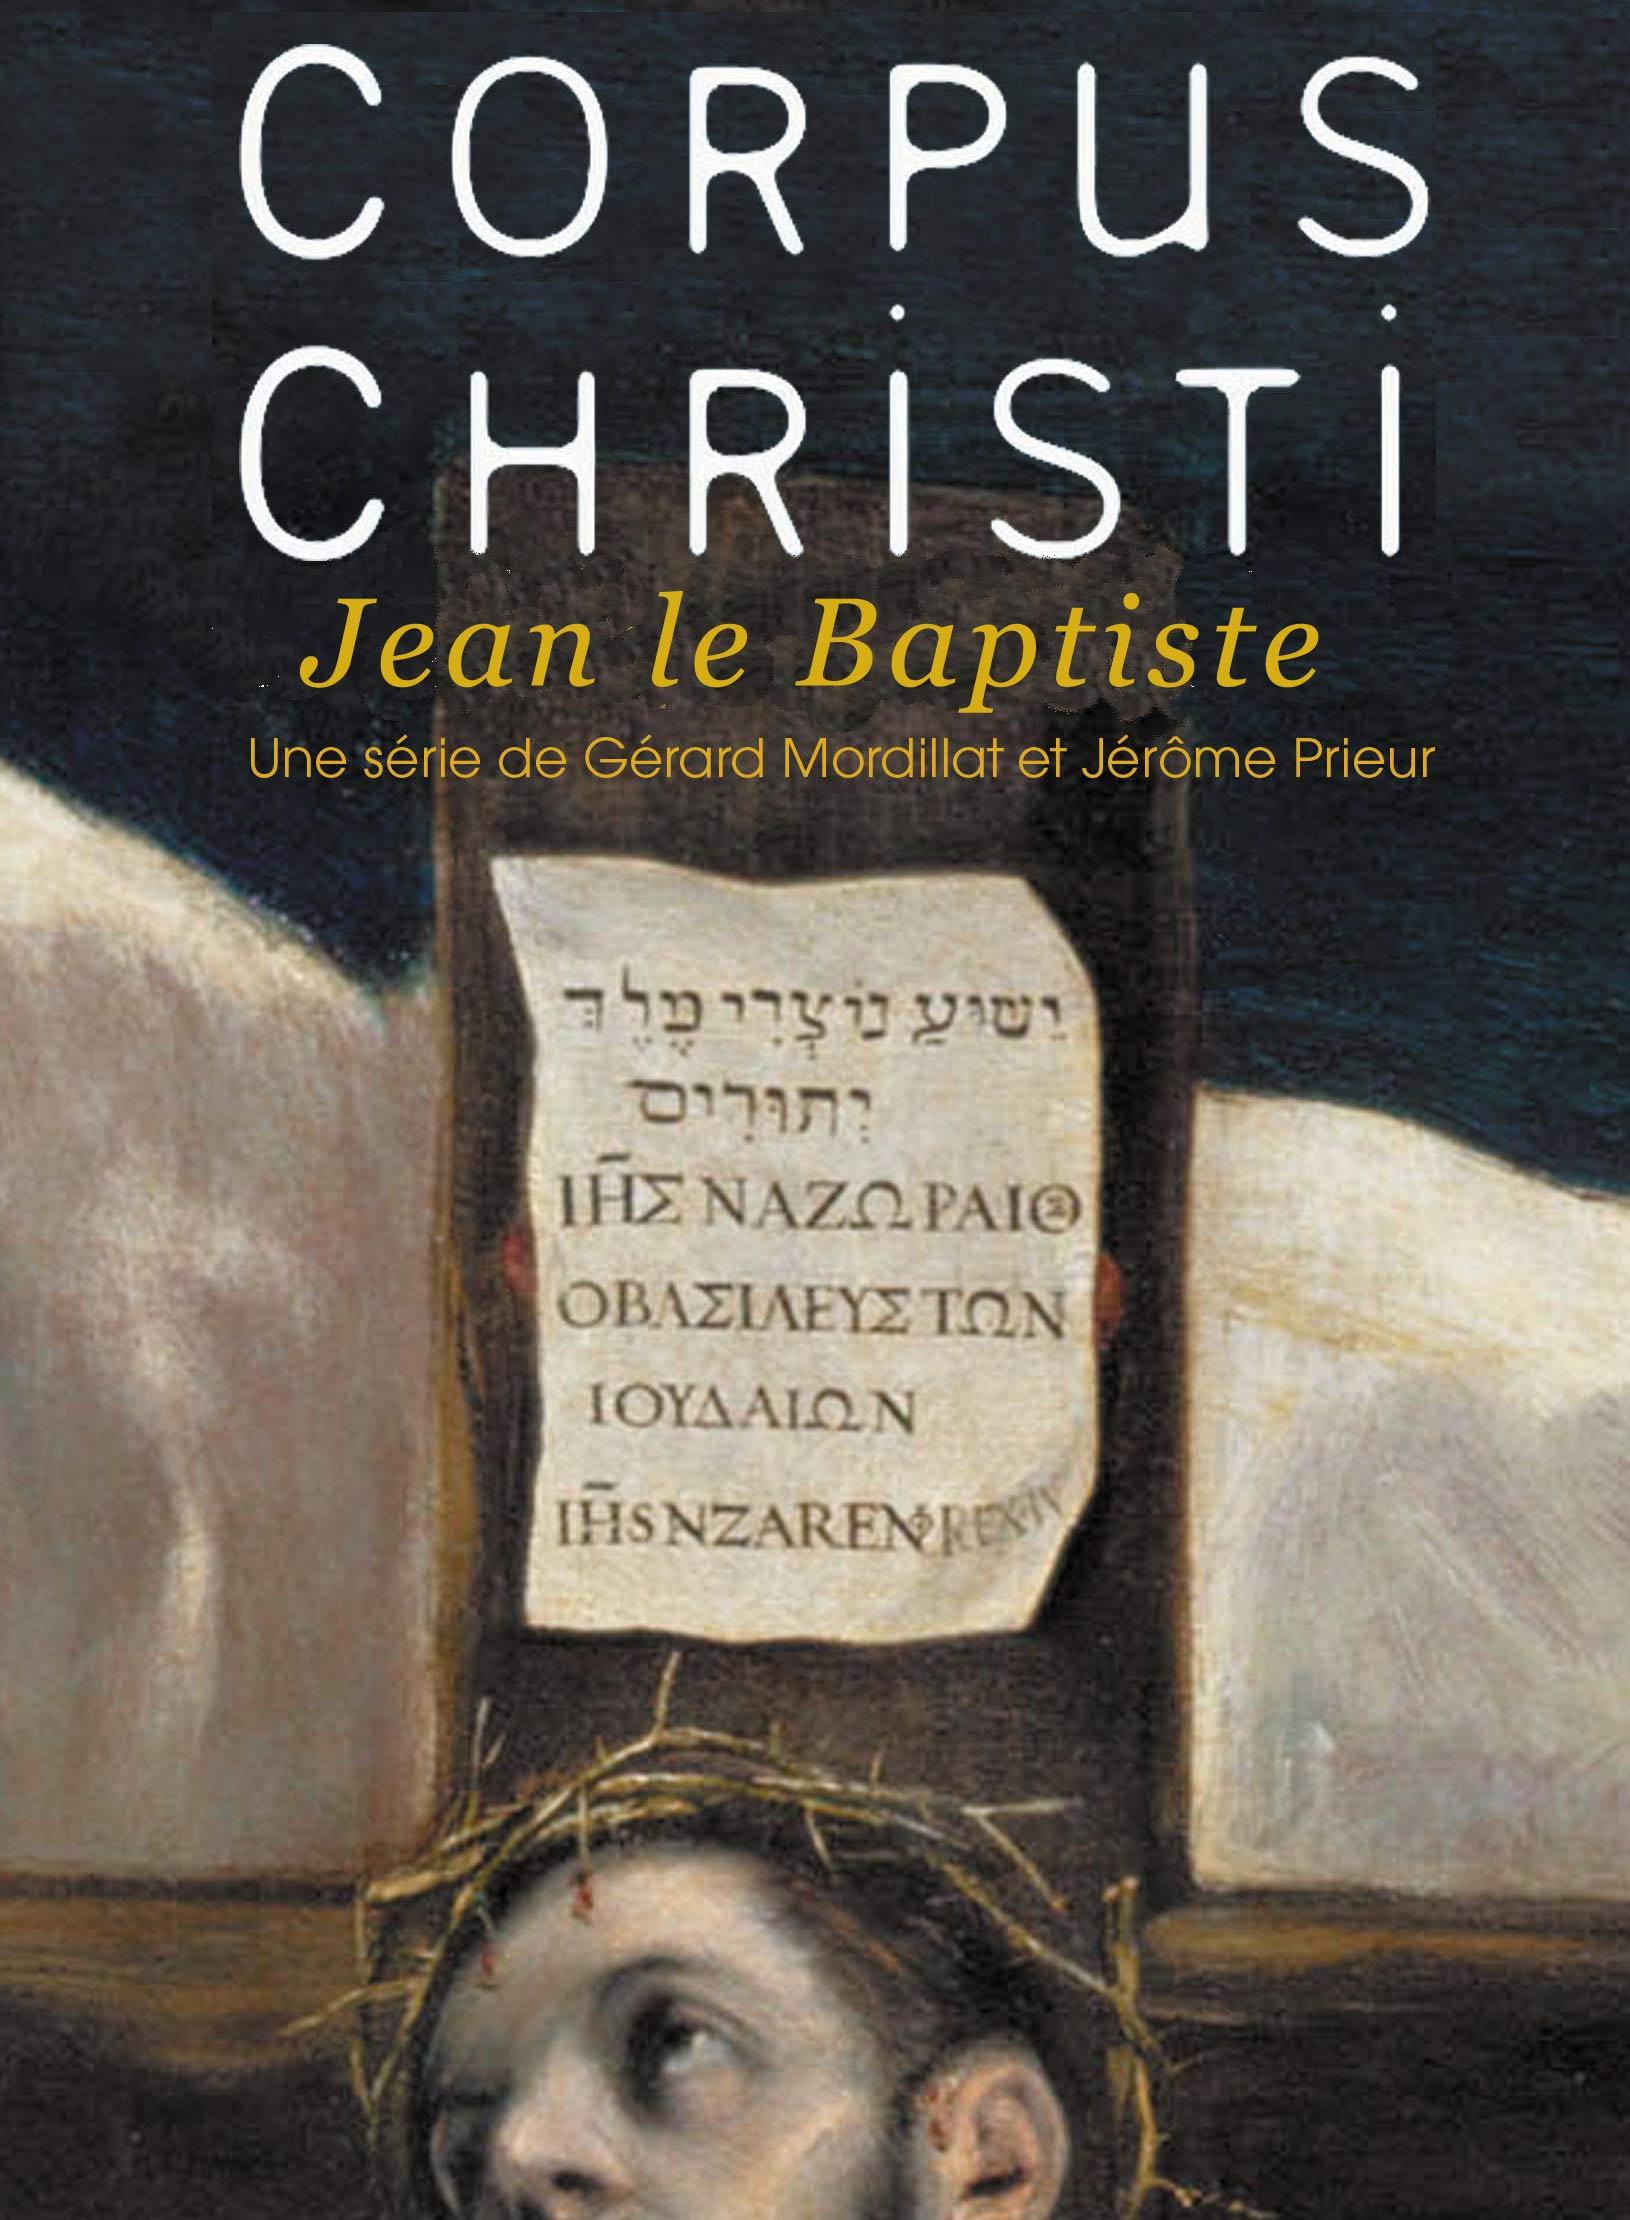 Corpus Christi - Jean Le Baptiste | Mordillat, Gérard (Réalisateur)